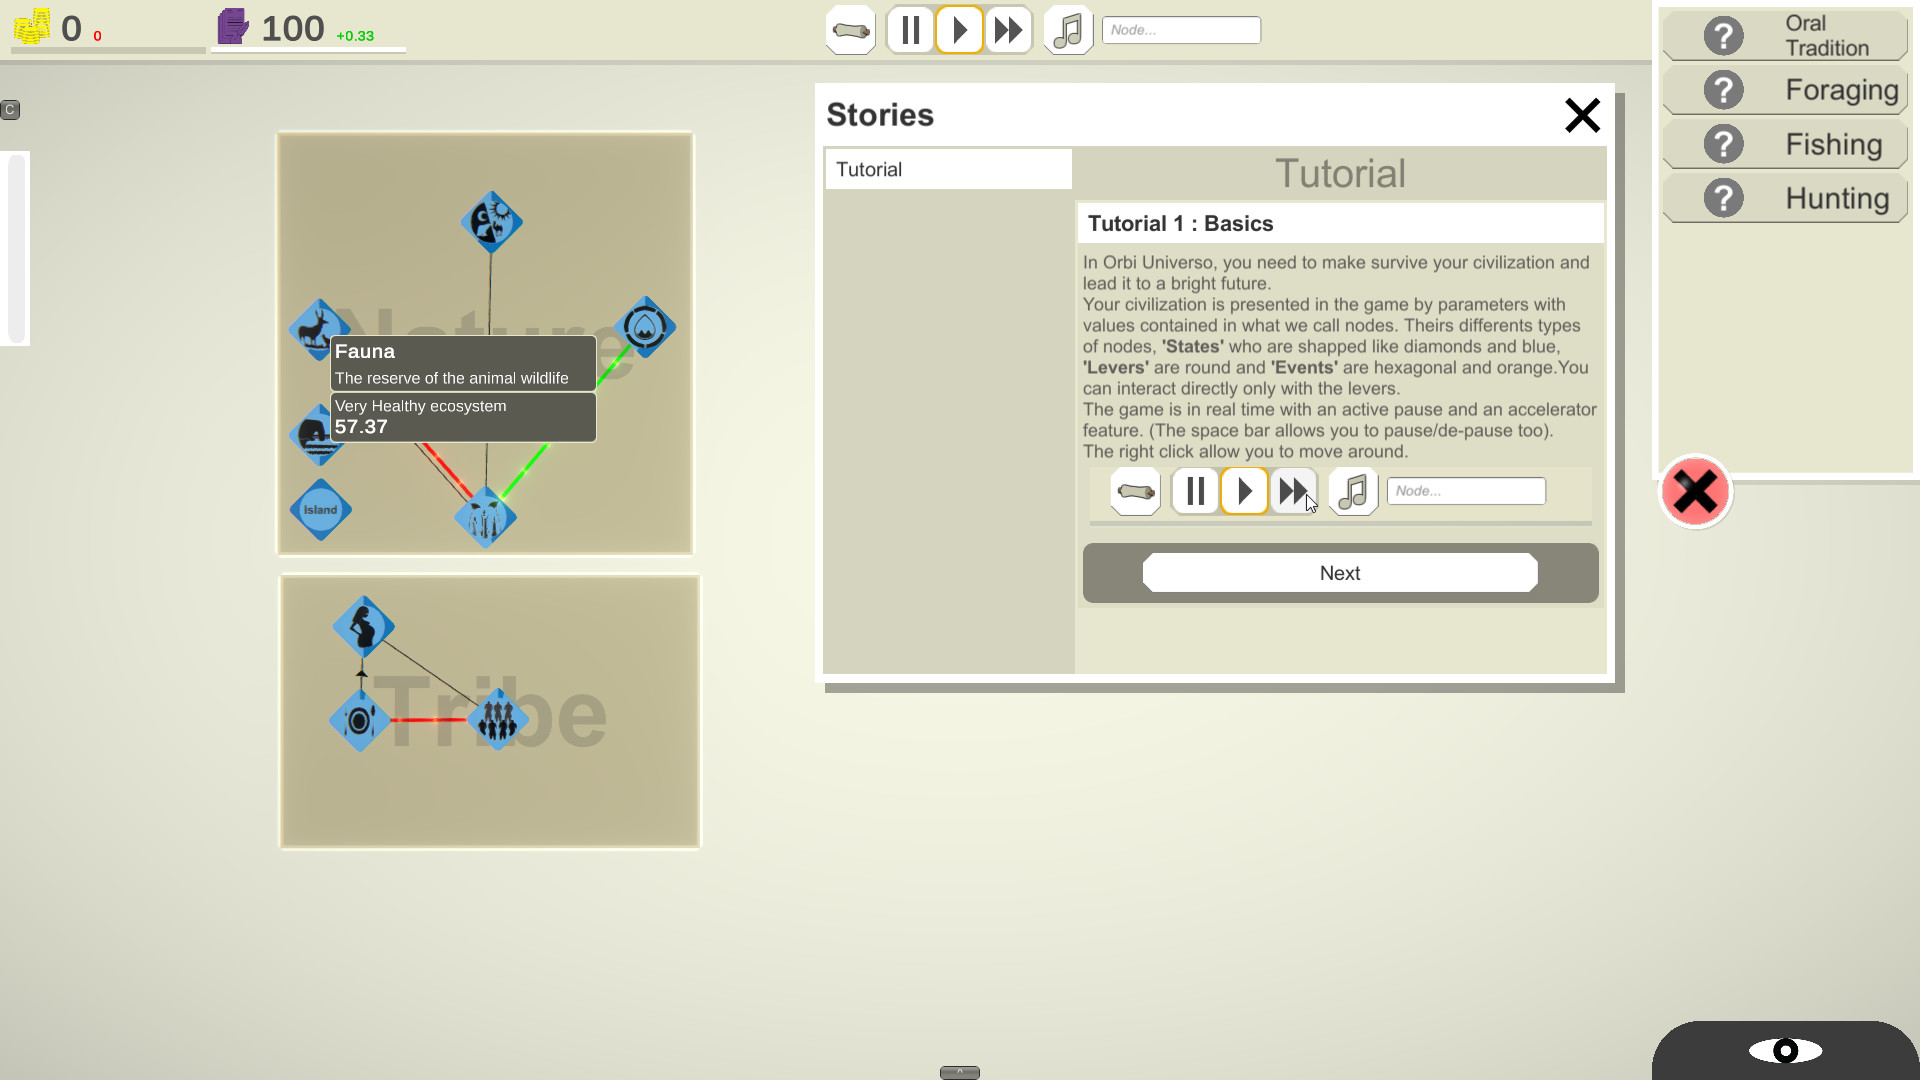 Orbi Universo on Steam